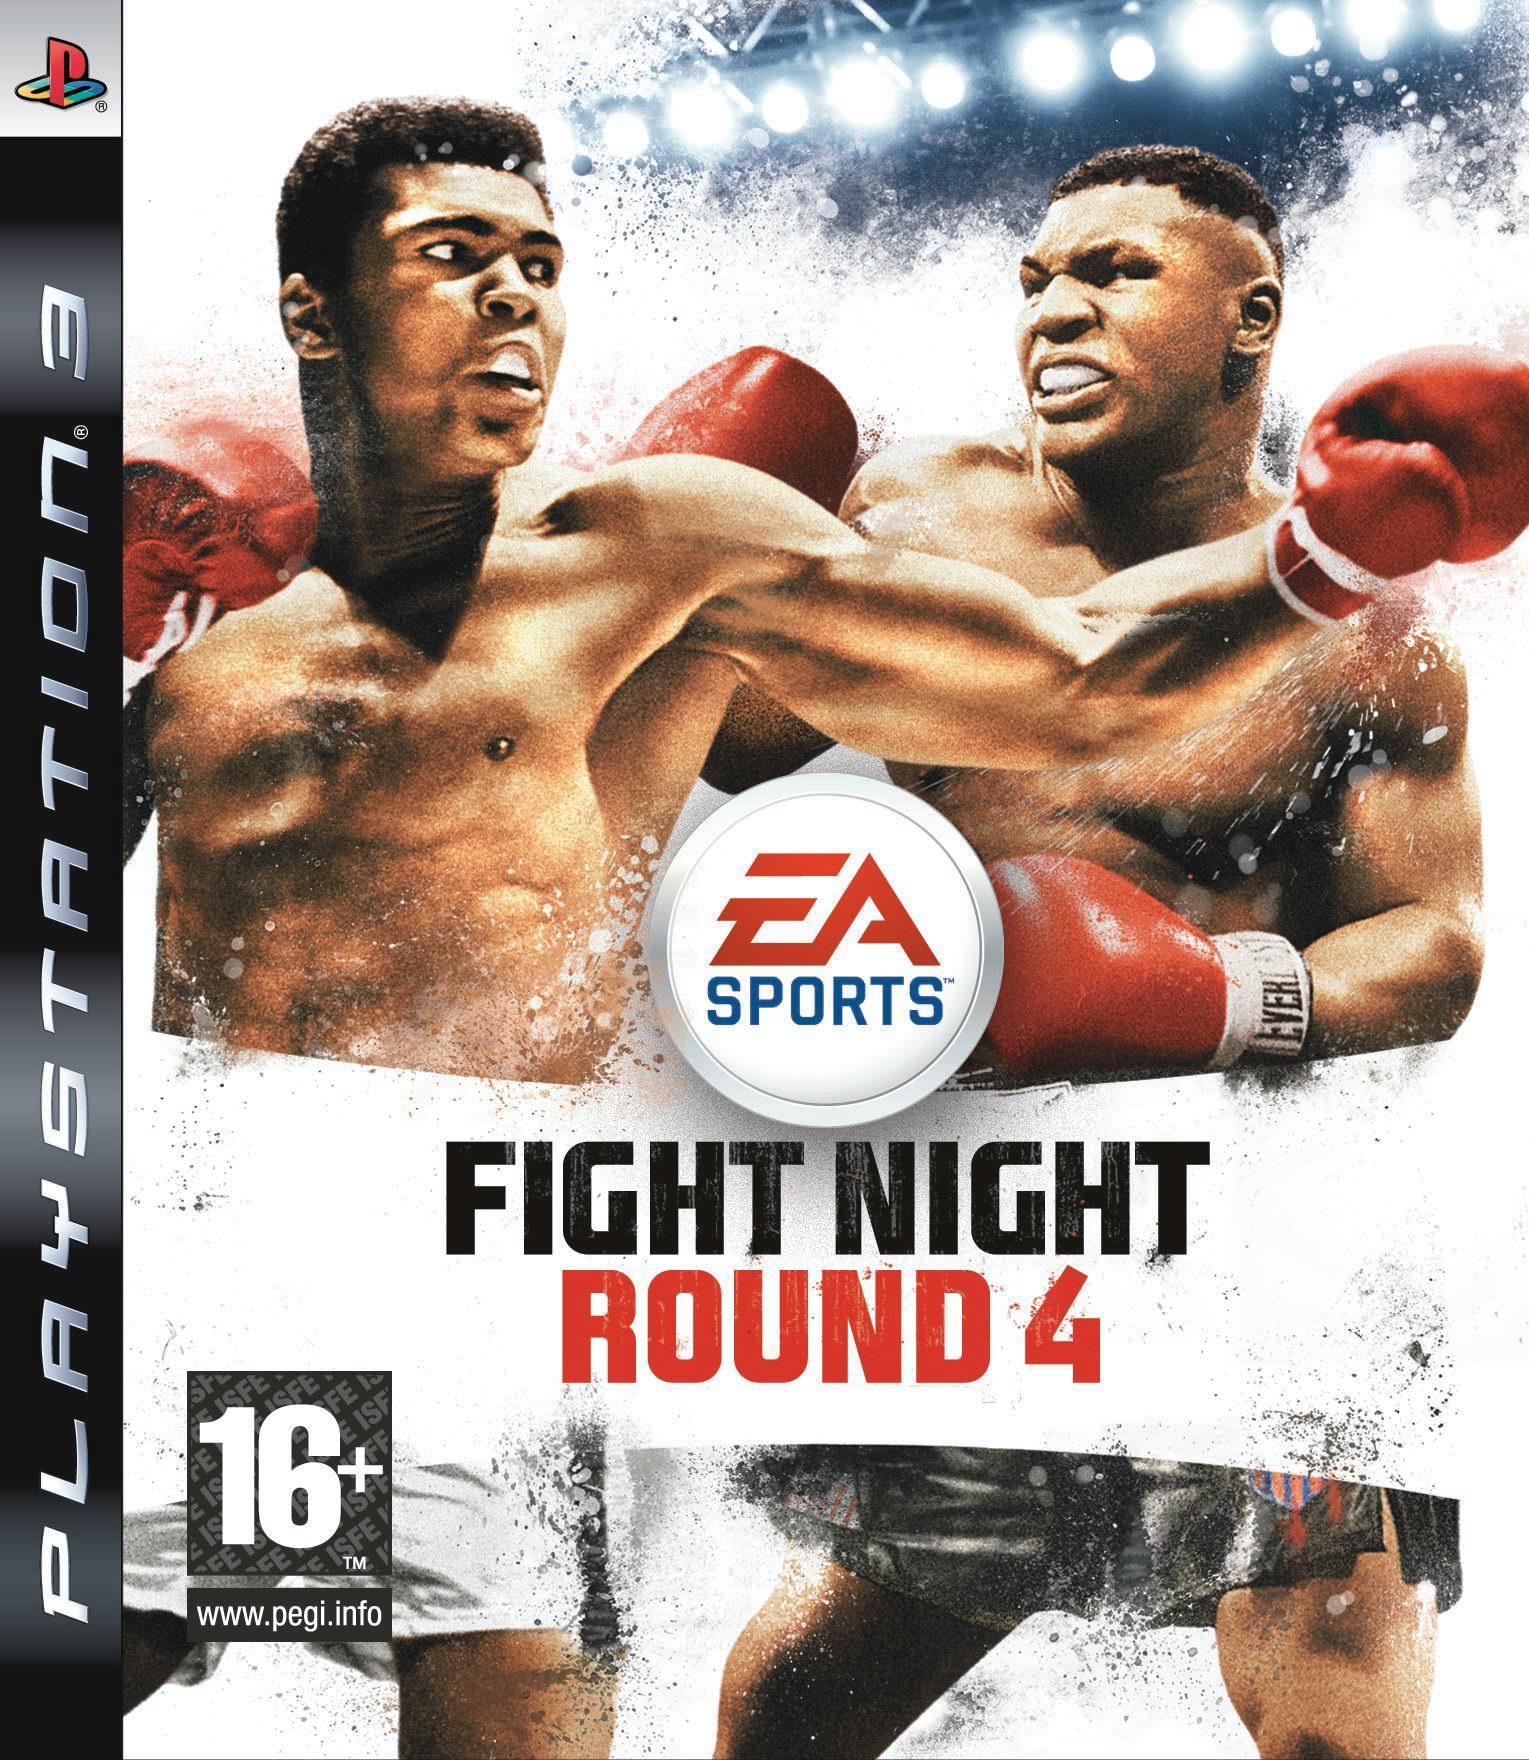 FightNight Round4 PS3